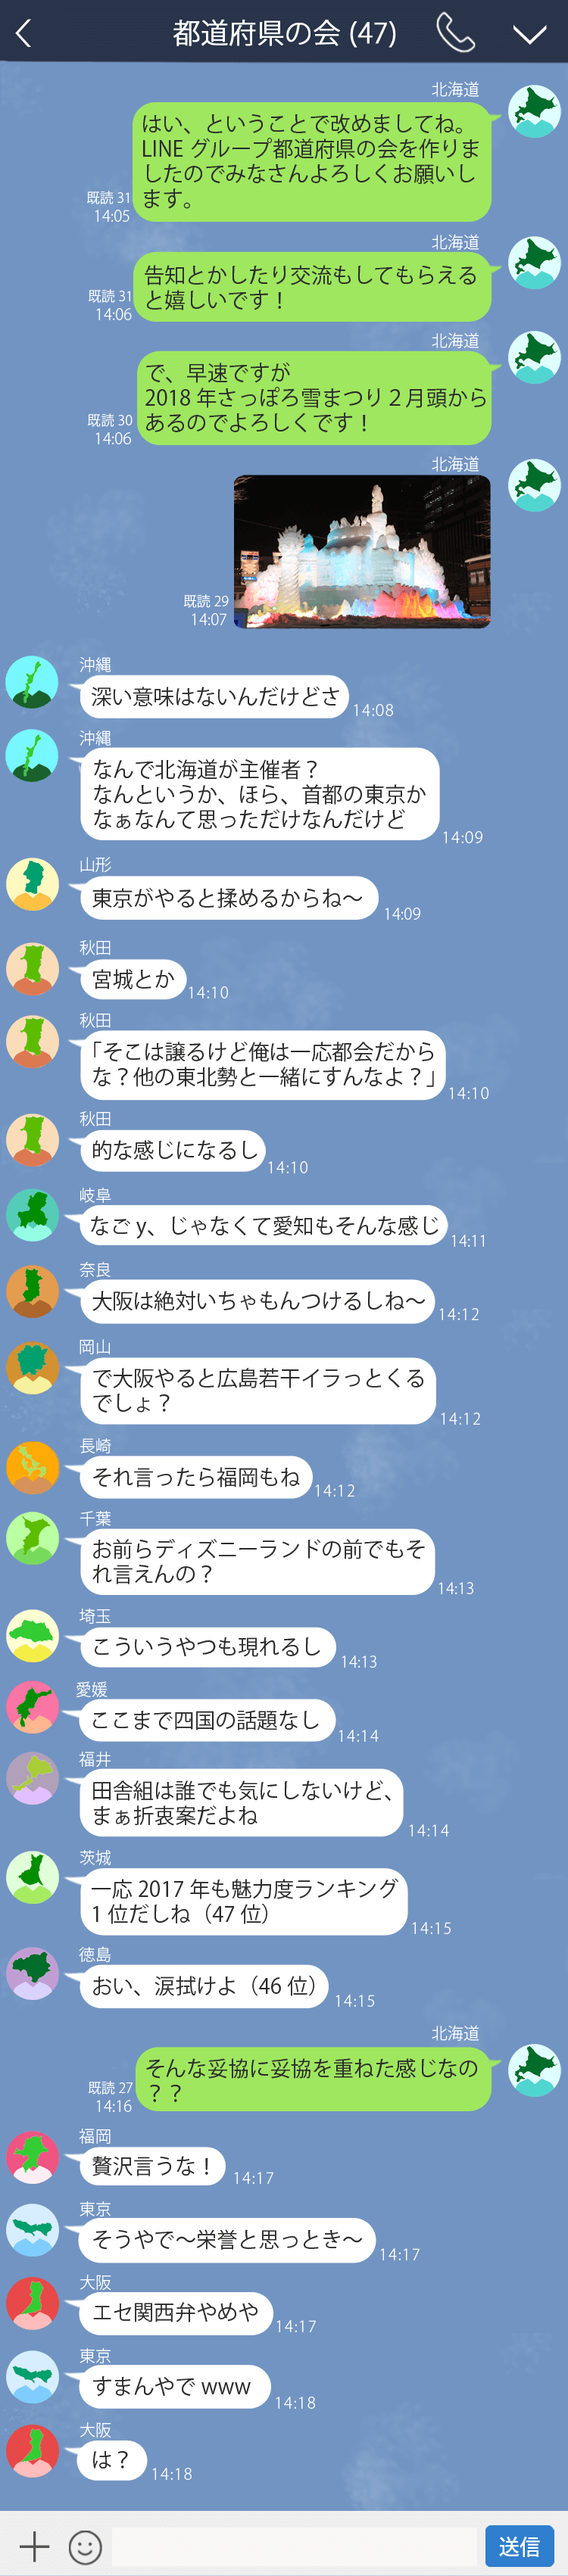 todohuken_LINE_1